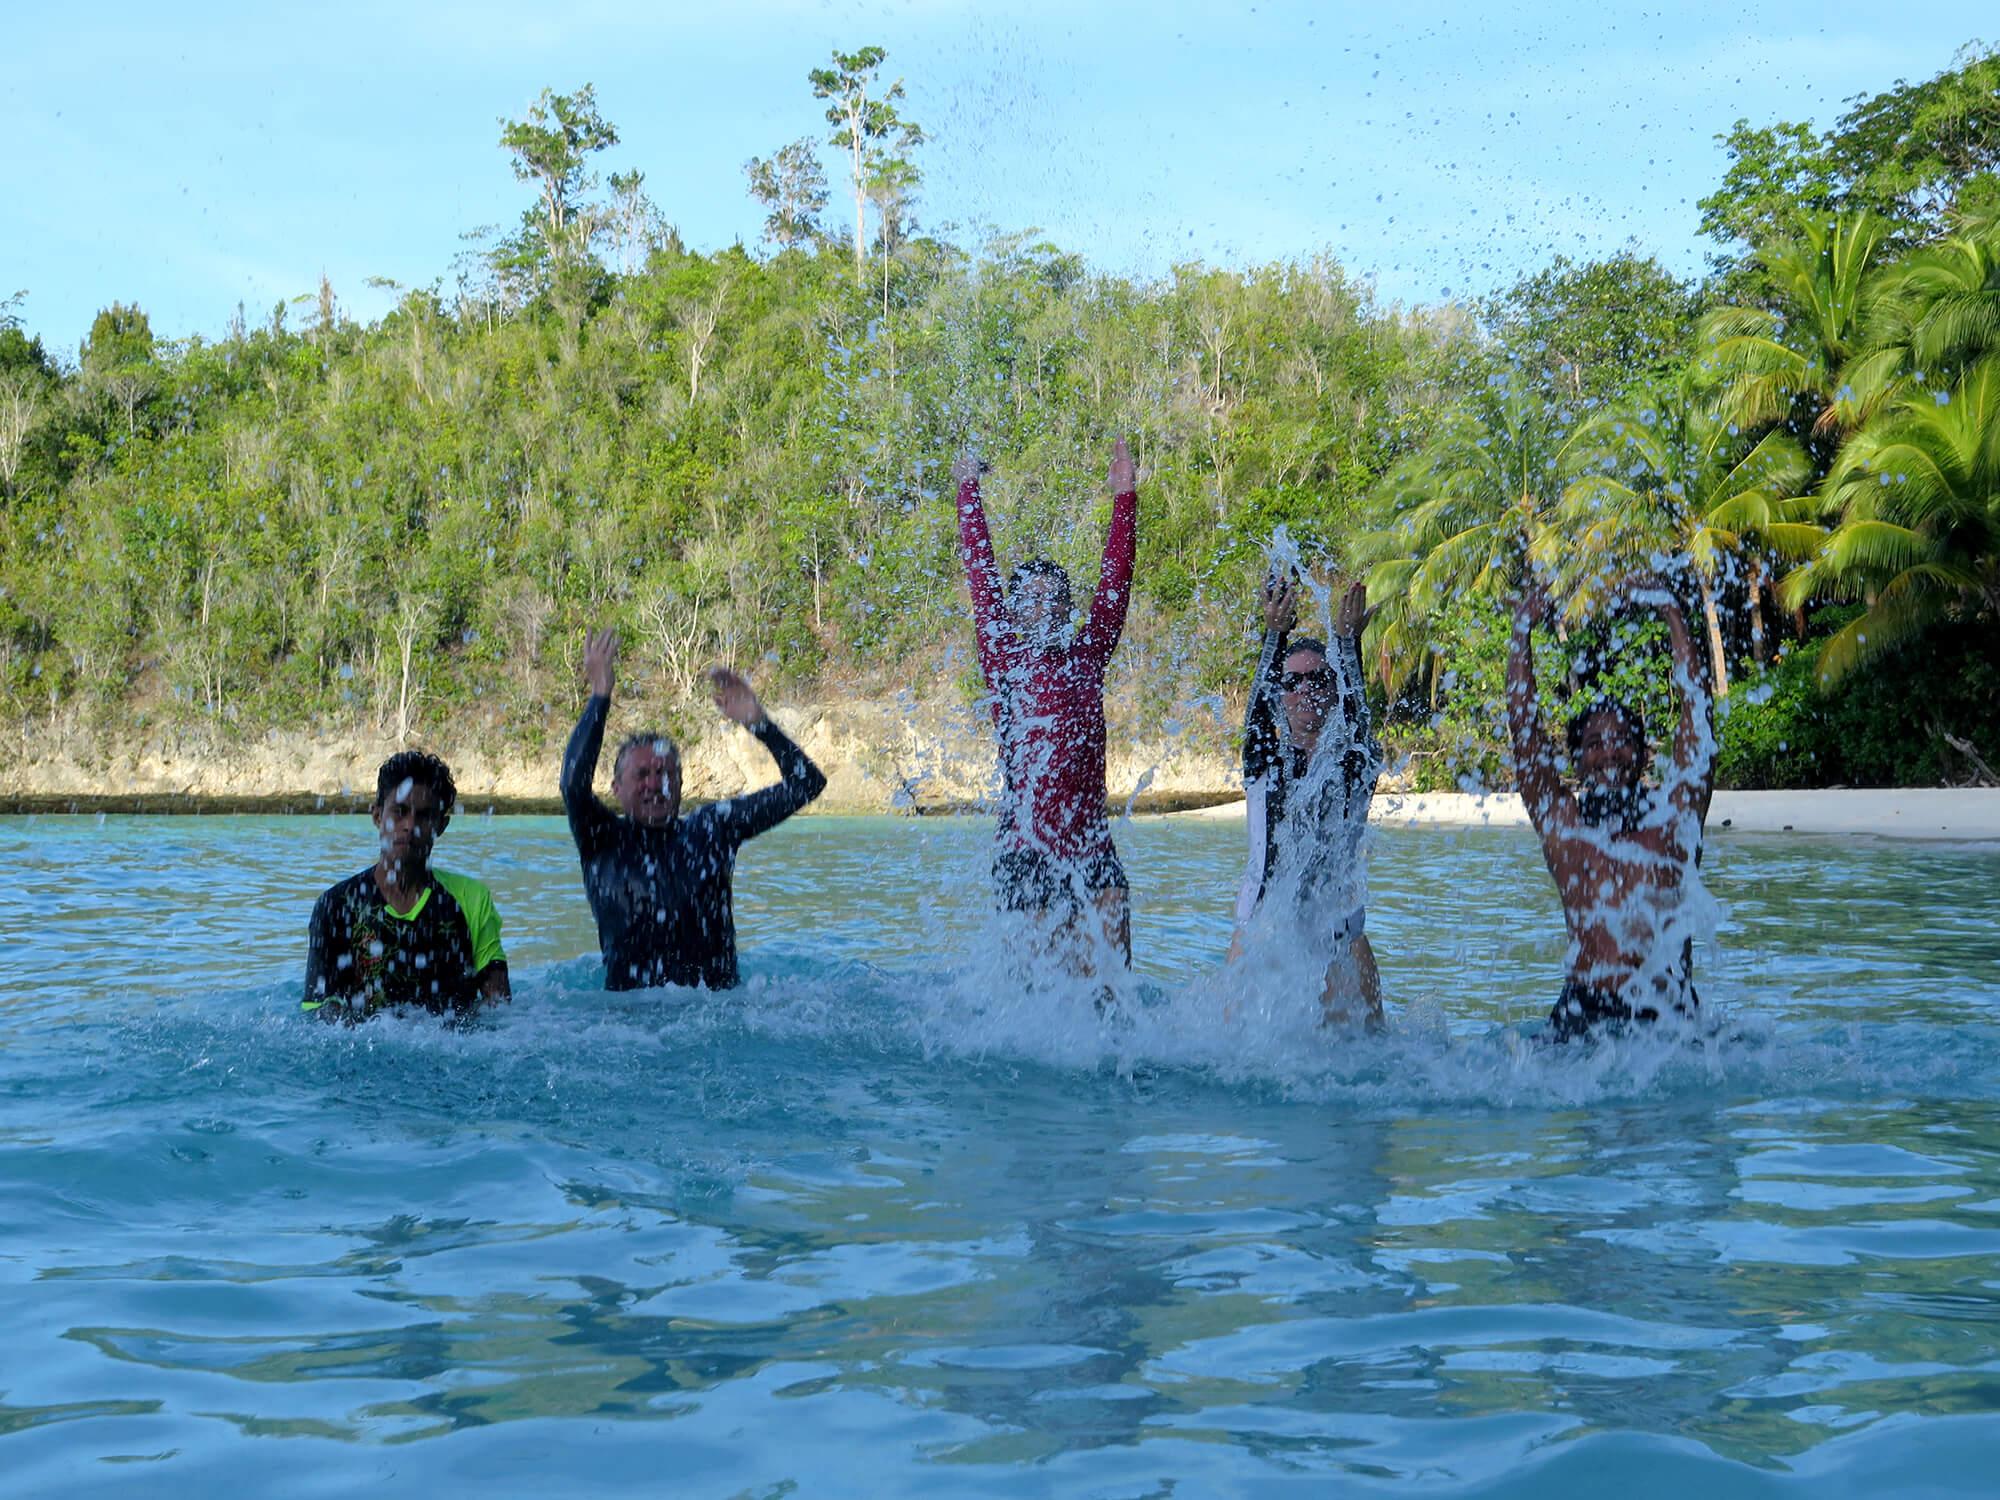 Photojump en Karina Beach en las islas Togean de Sulawesi